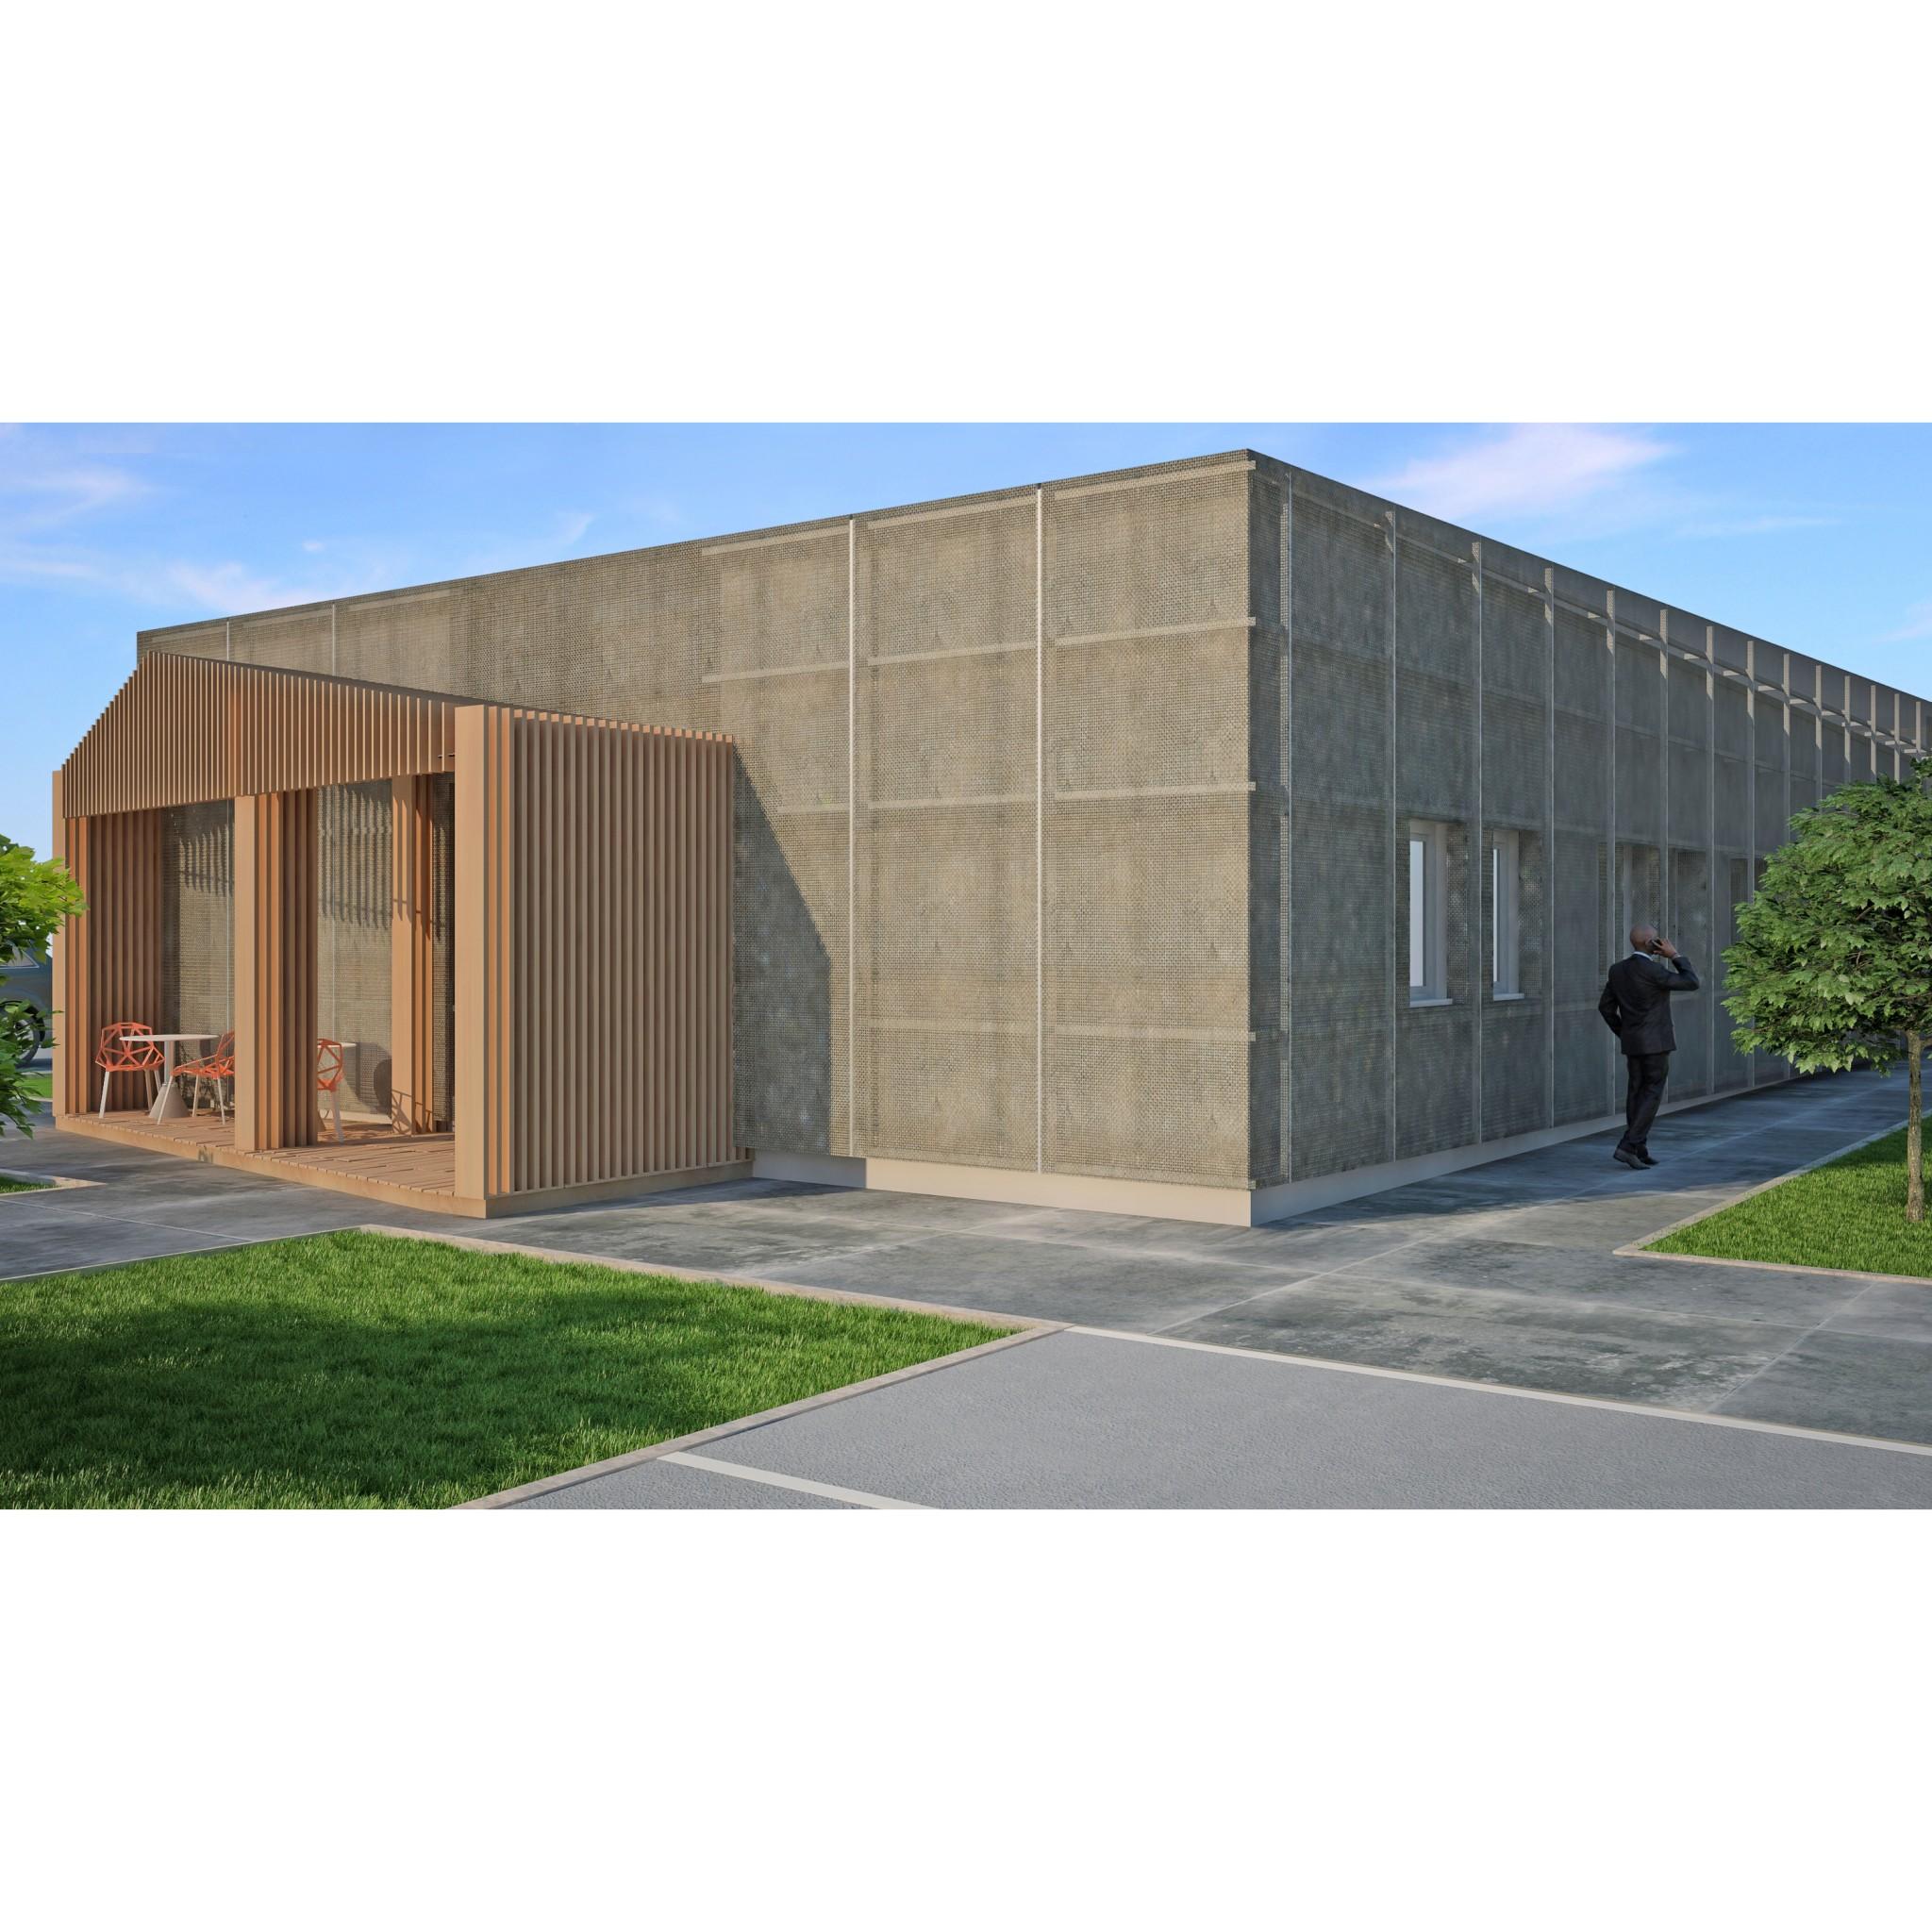 Squarcina restyling di un capannone industriale squarcina for Capannone moderno